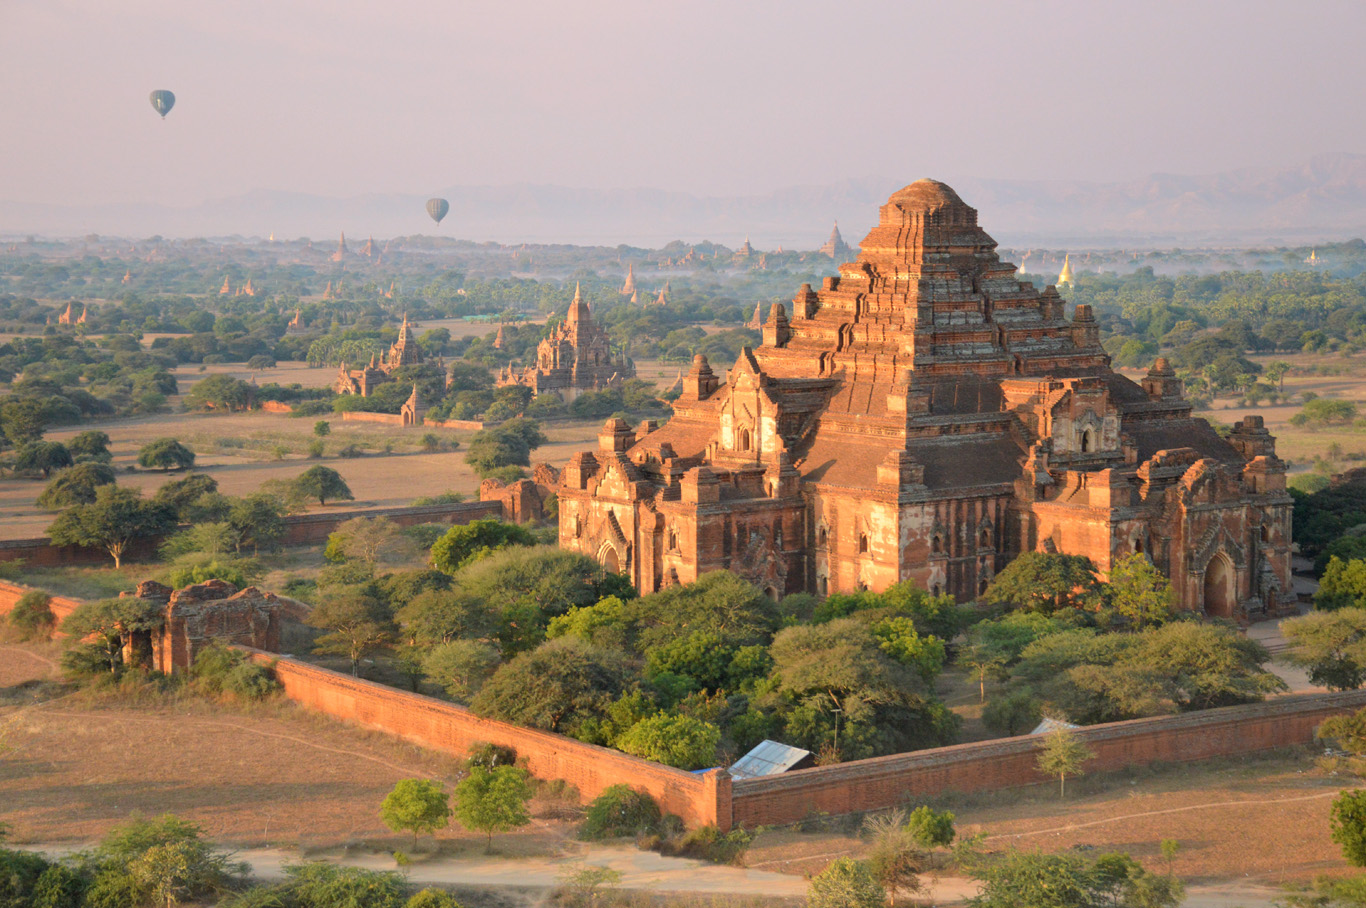 Balloons over Bagan, Myanmar - Is It Worth The Money